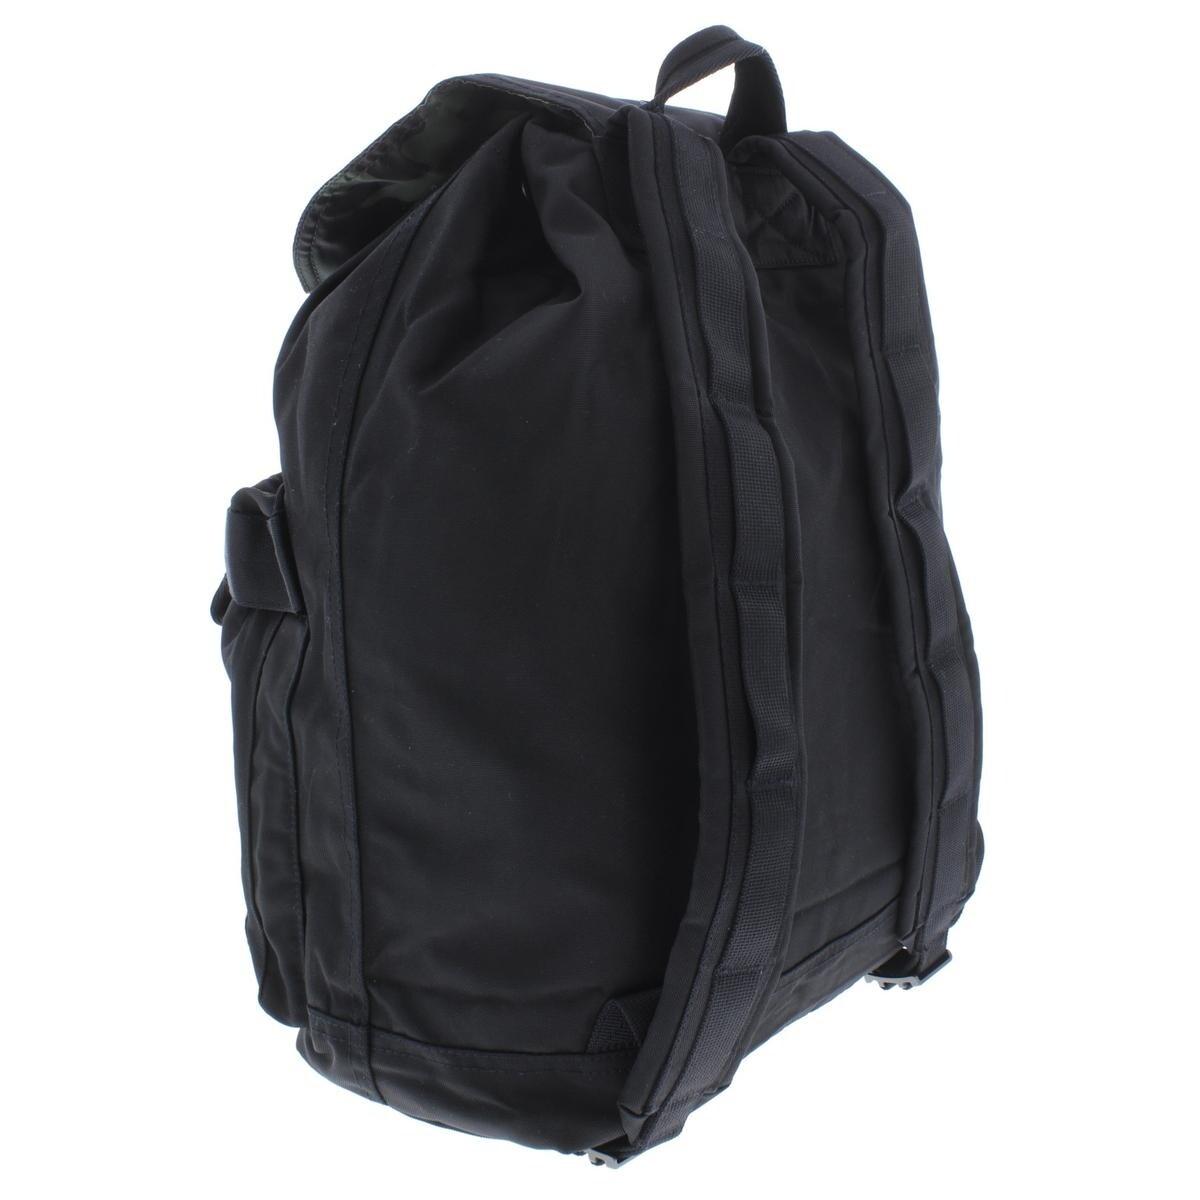 Shop Polo Ralph Lauren Mens Backpack Nylon Laptop - o s - Free ... ff5a38995e22a